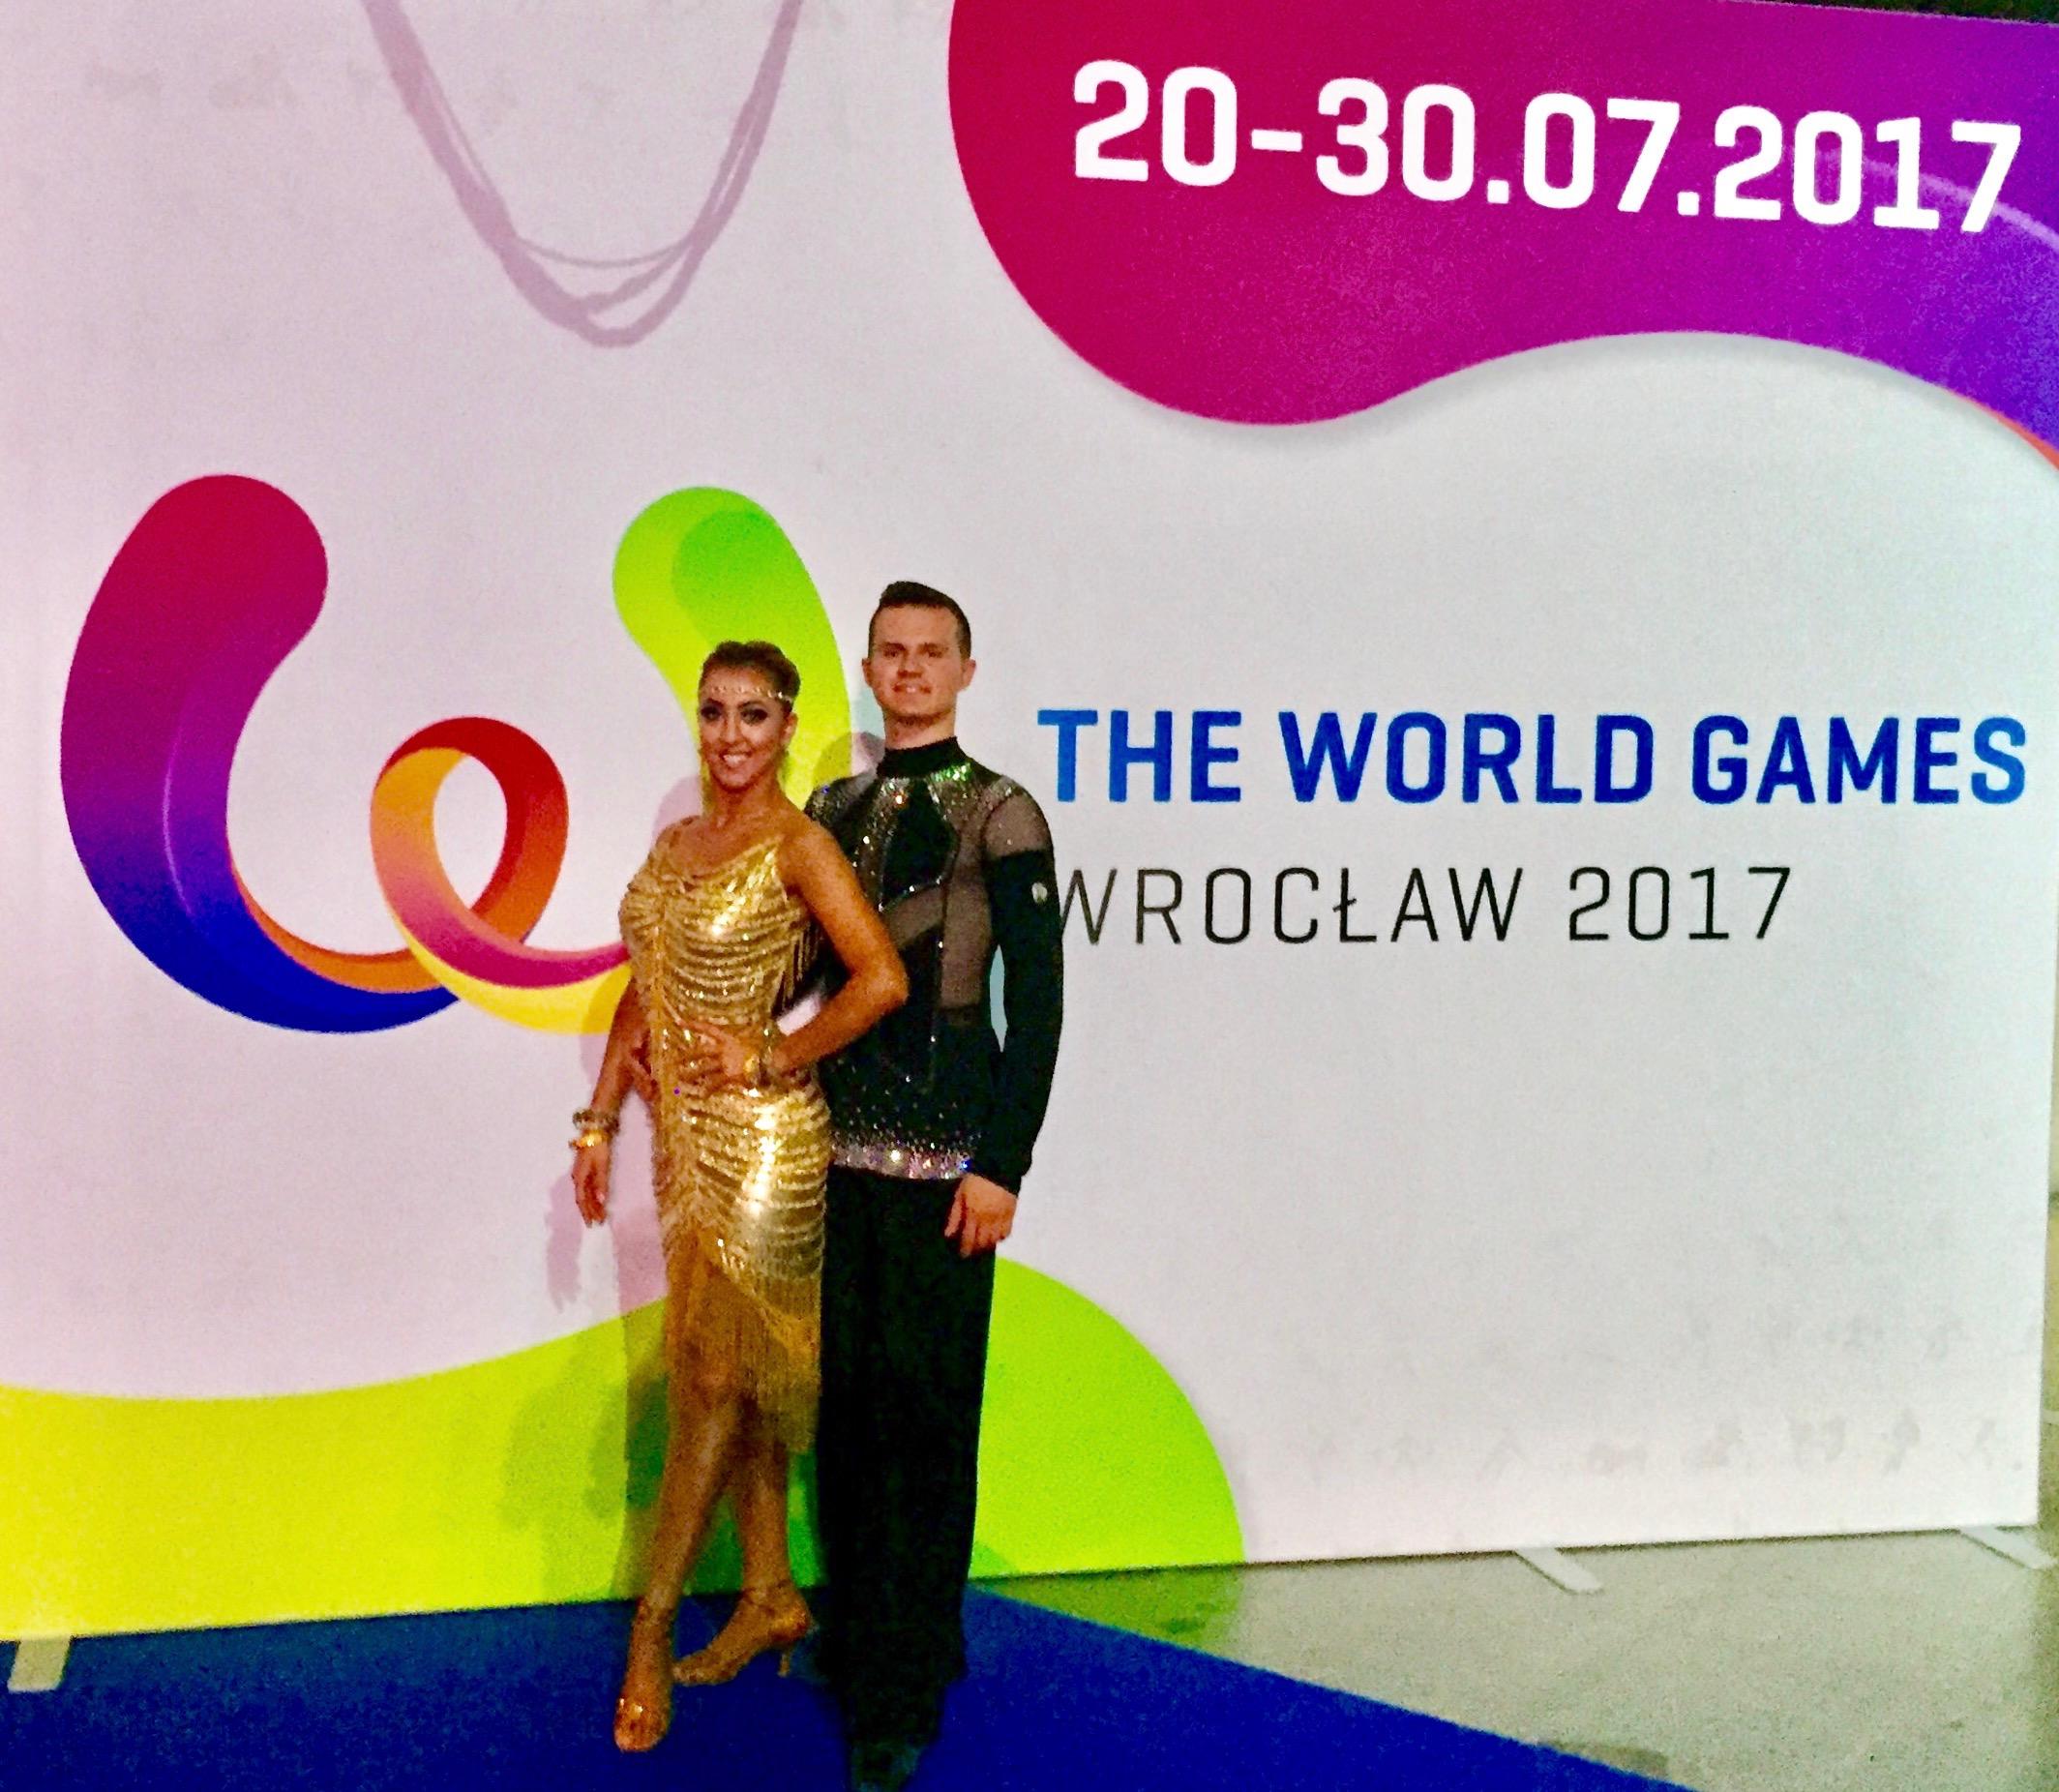 Sarah-Maude Thibaudeau et Daniel Zaharia - World Games 2017 in Wroclaw, Poland (Dance Sport).